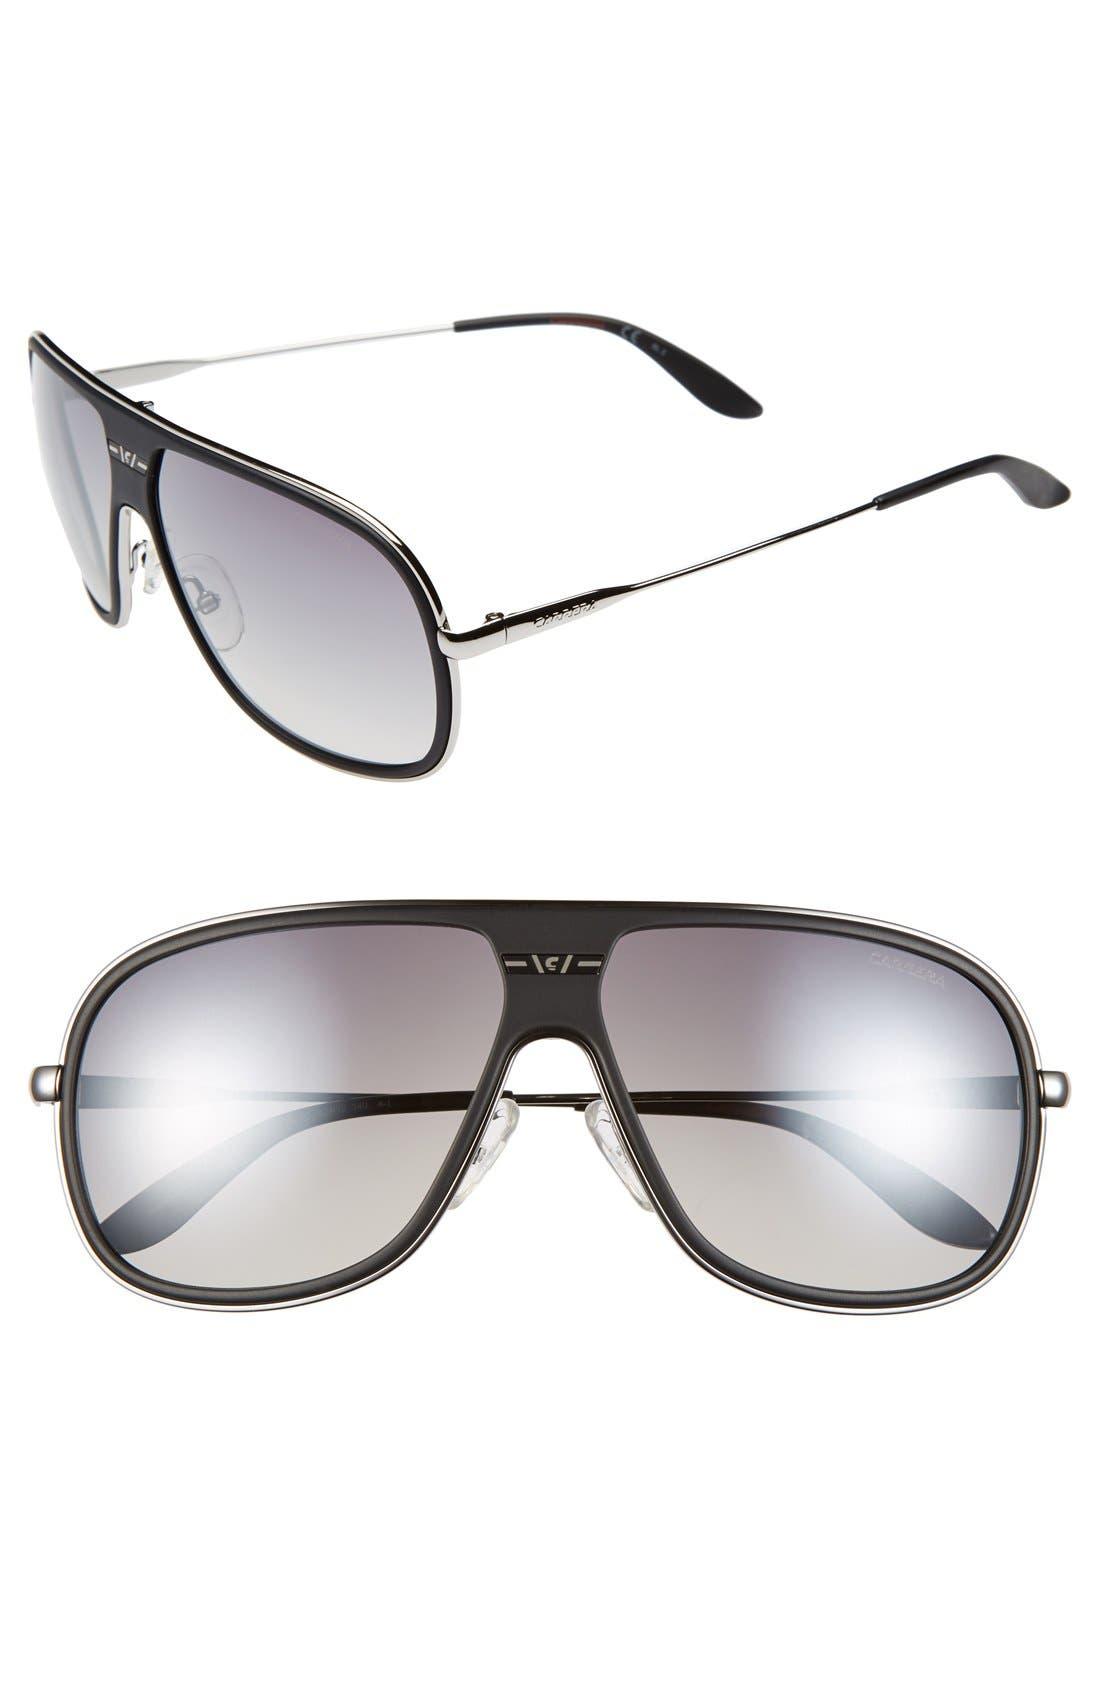 Alternate Image 1 Selected - Carrera Eyewear 62mm Retro Sunglasses